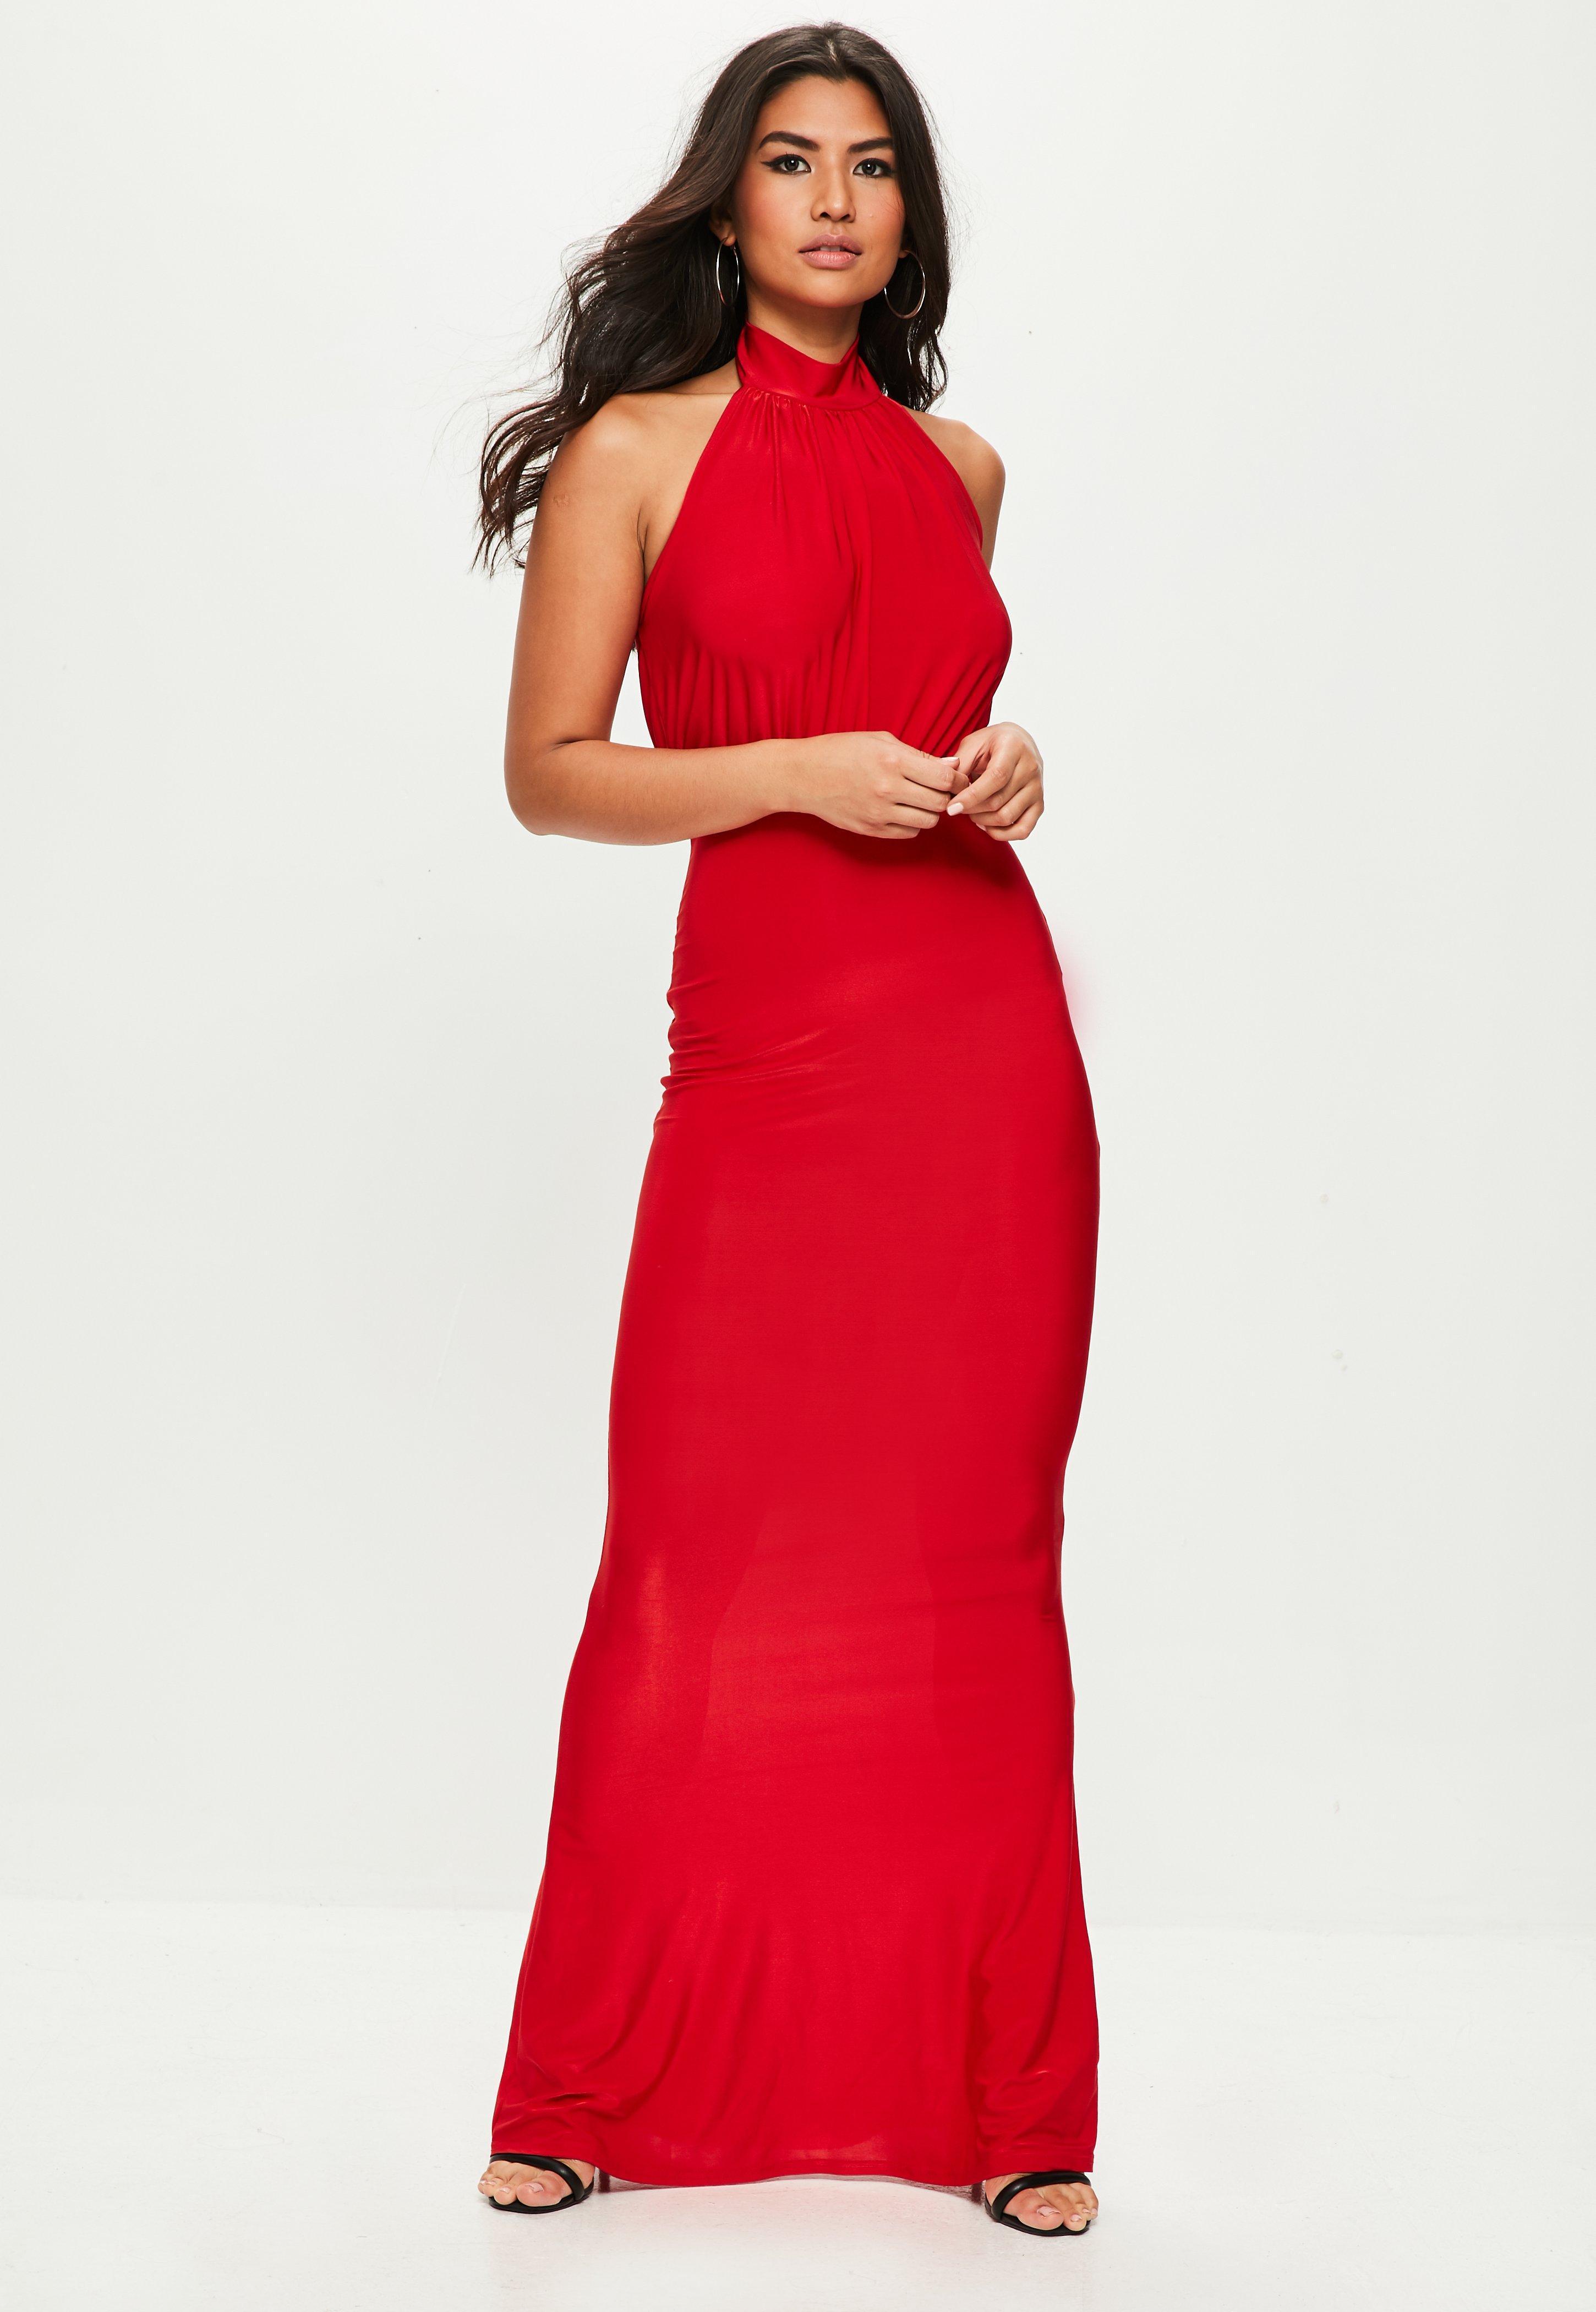 Robe de bal de promo rouge